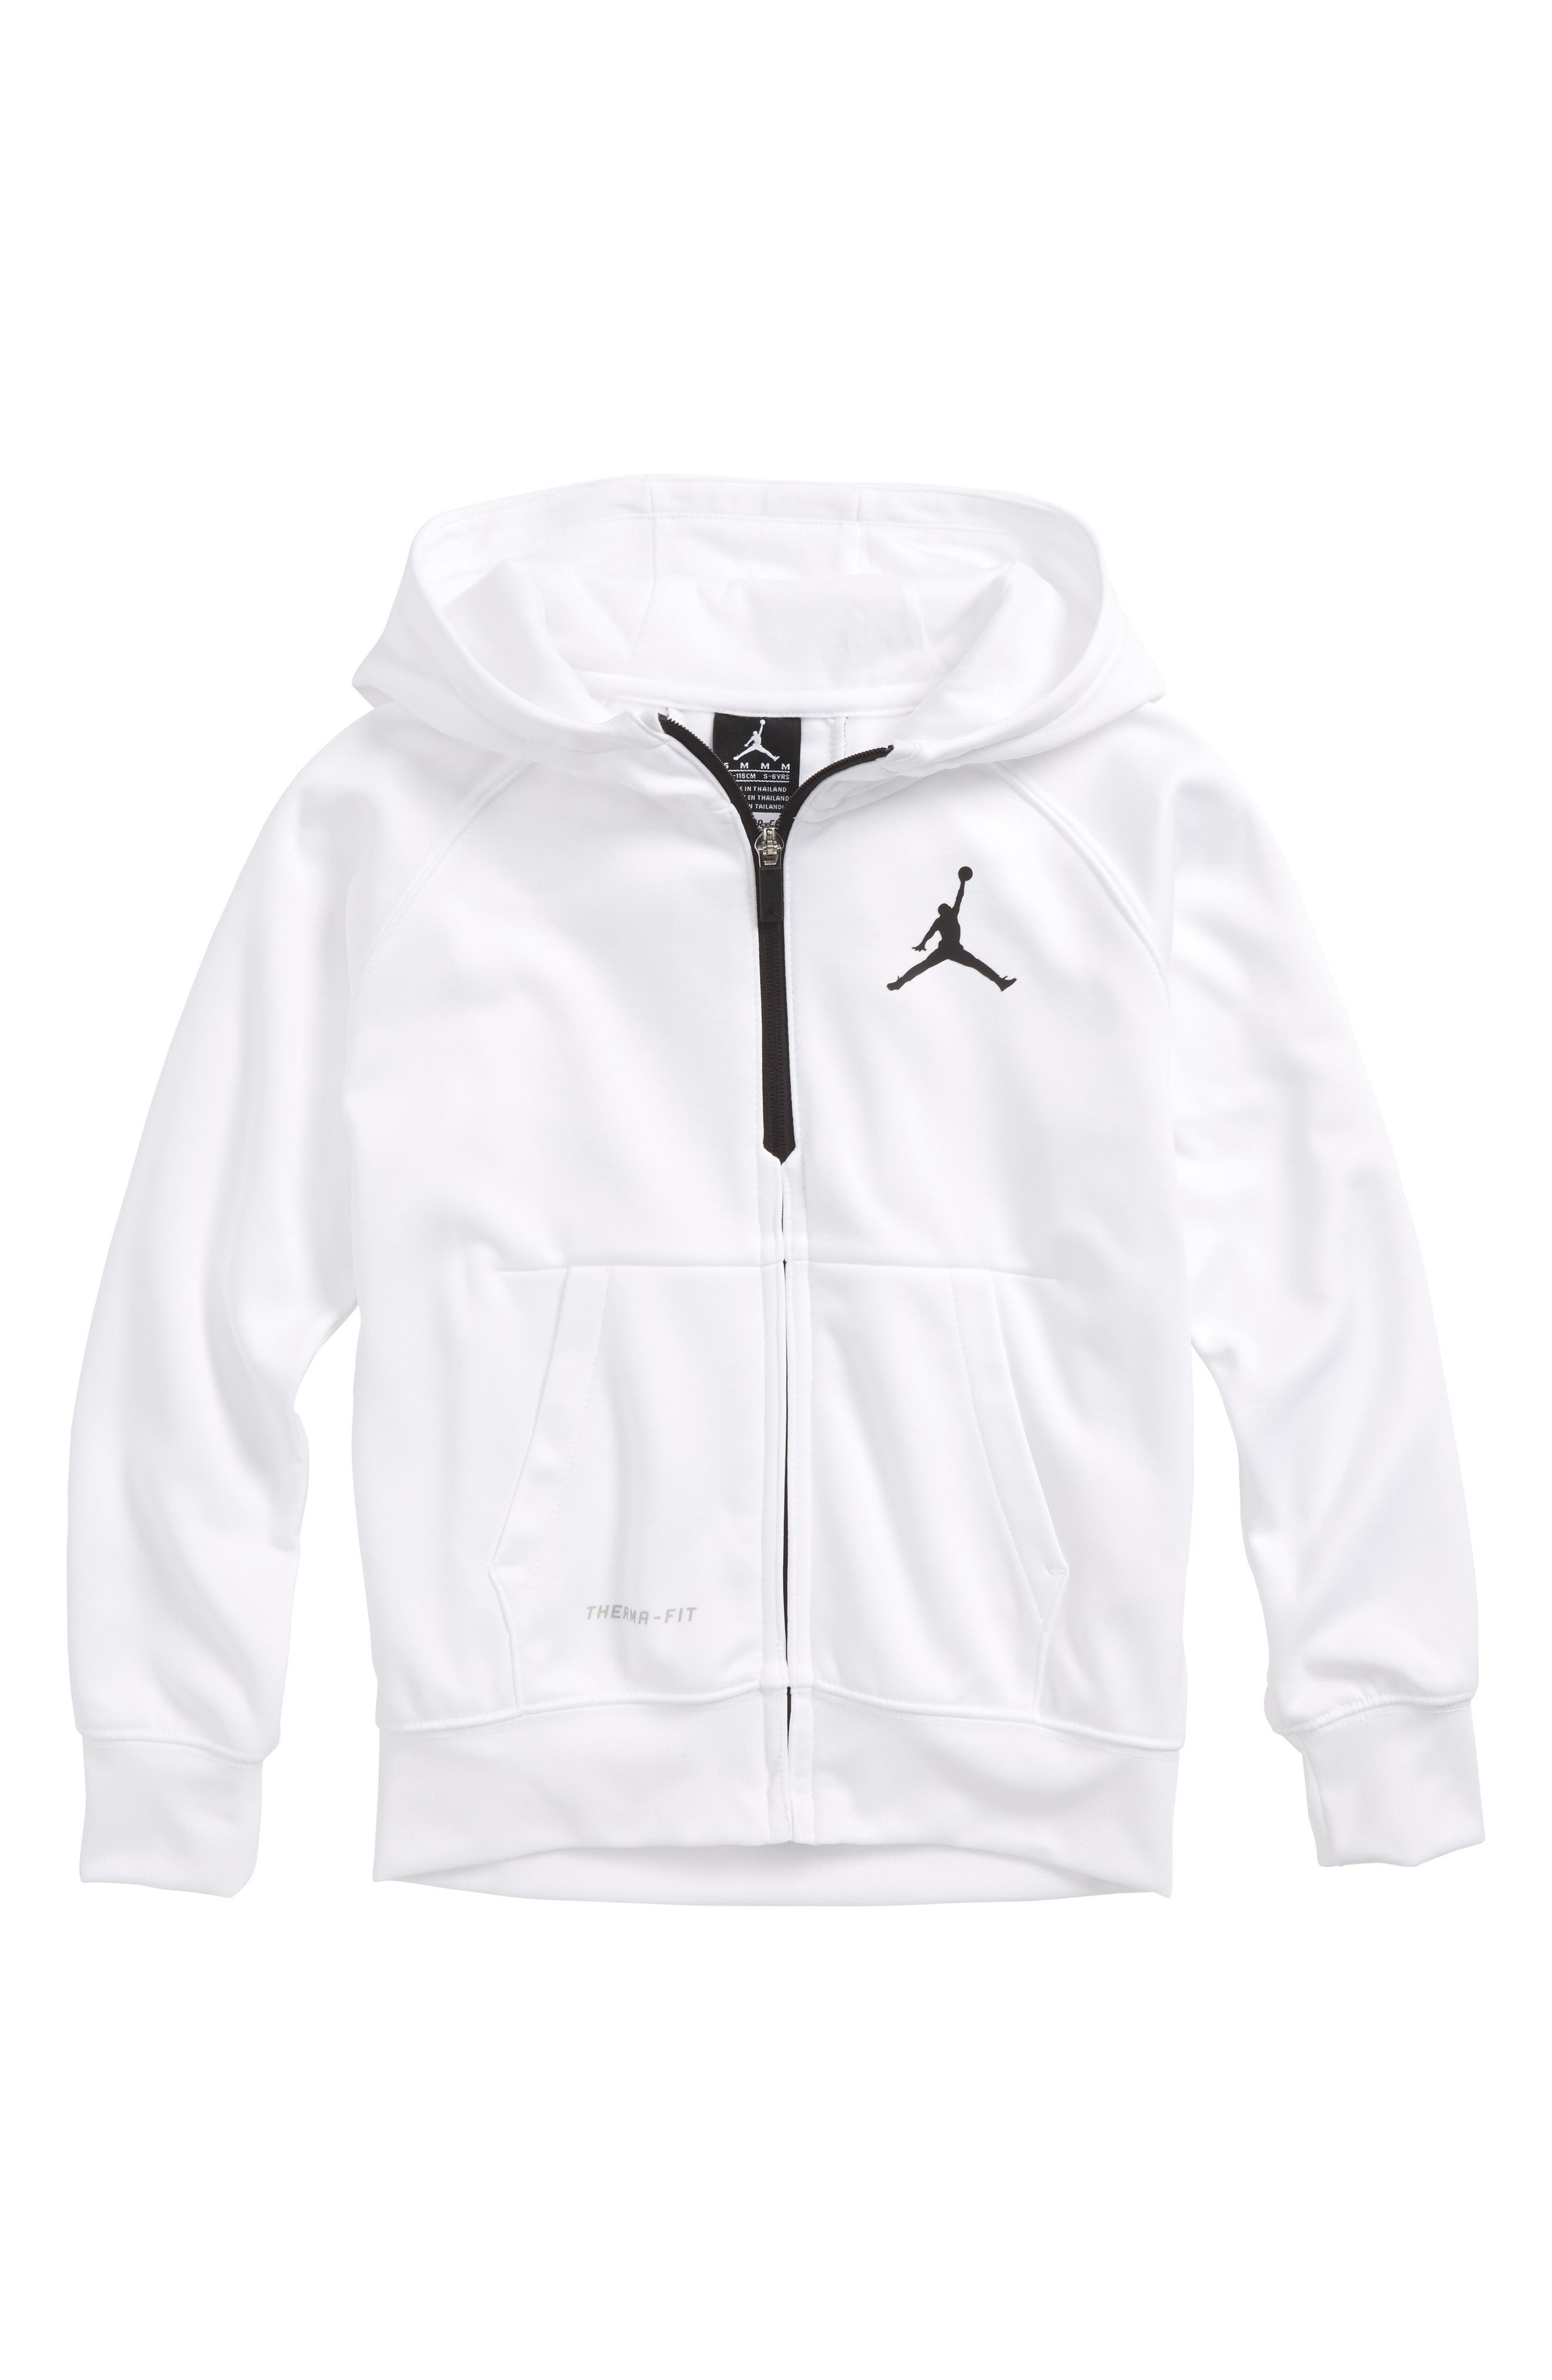 Jordan Dry 23 Alpha FZ Therma-FIT Zip Hoodie,                             Main thumbnail 1, color,                             White